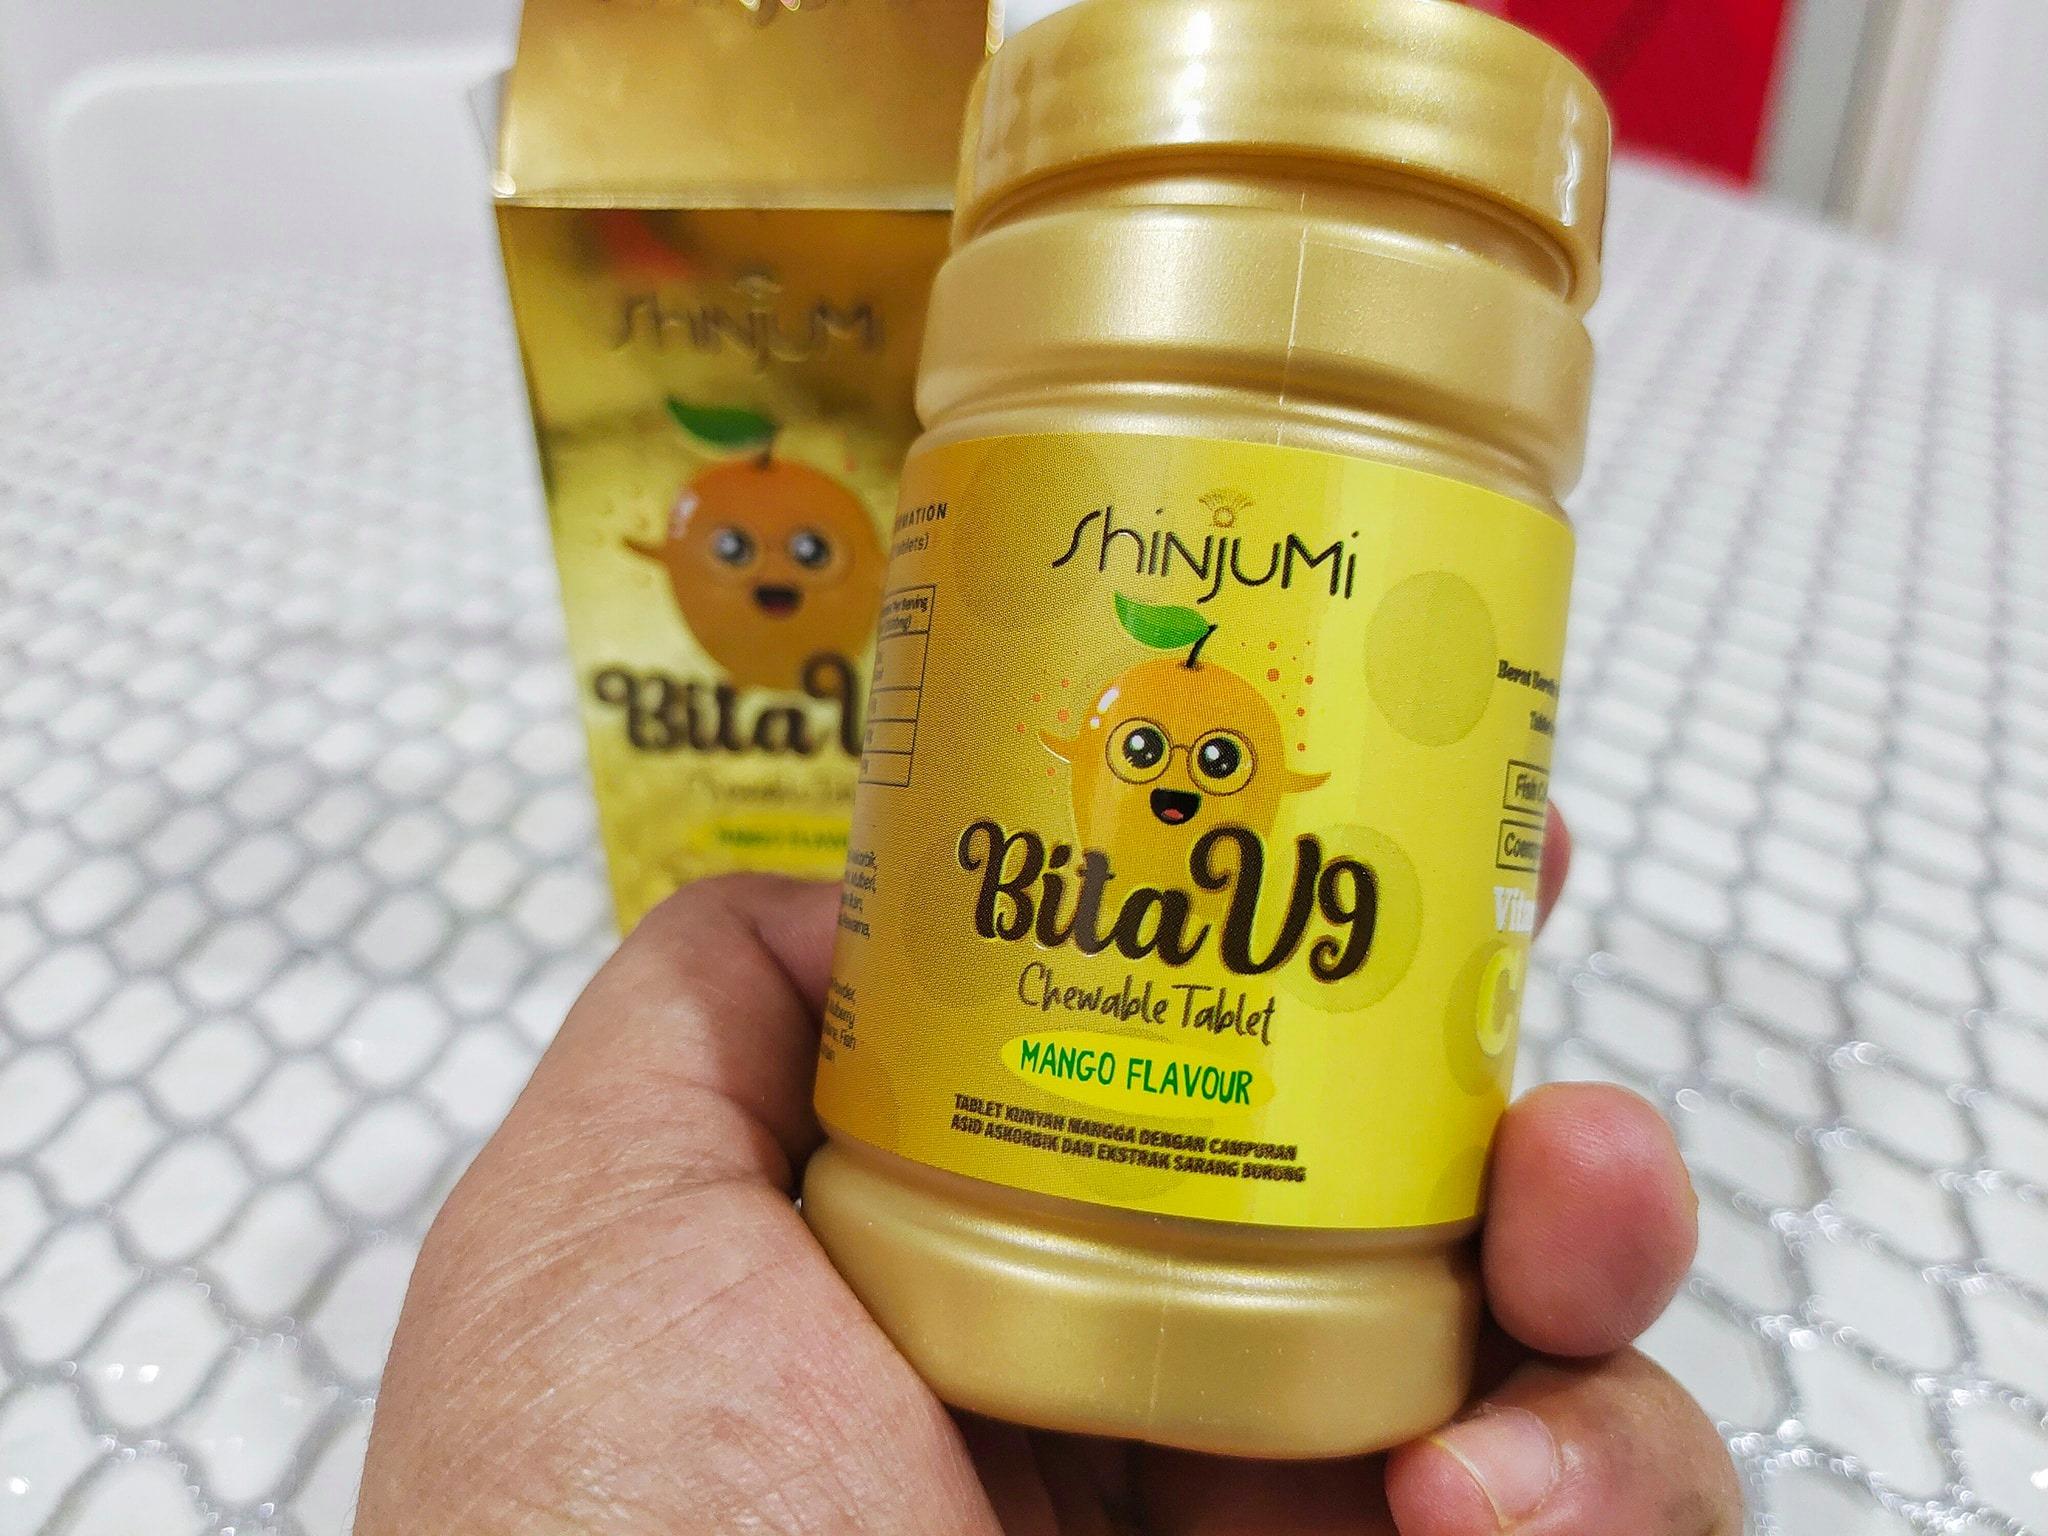 Dah Seminggu Aku Makan Shinjumi BitaV9 Ni, Nampak Kulit Tangan Kering Aku Jadi Lembab